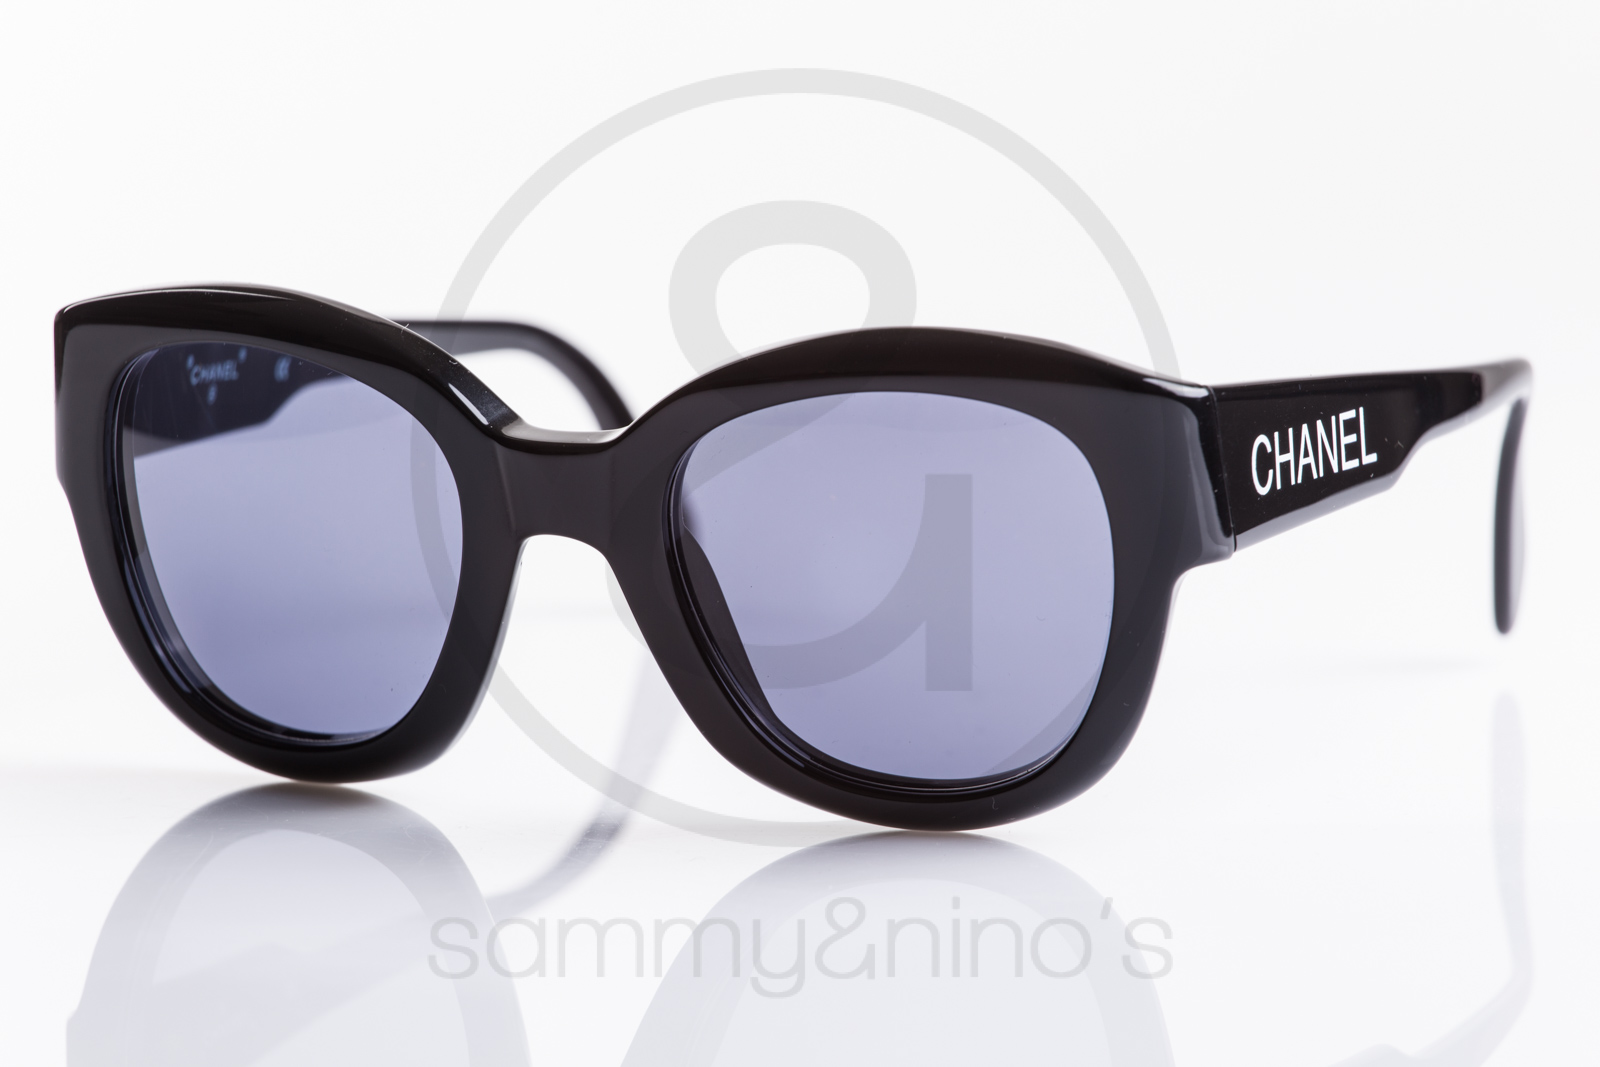 227edf1345ac Enchanting Chanel Frames Women Adornment - Frames Ideas Handmade ...